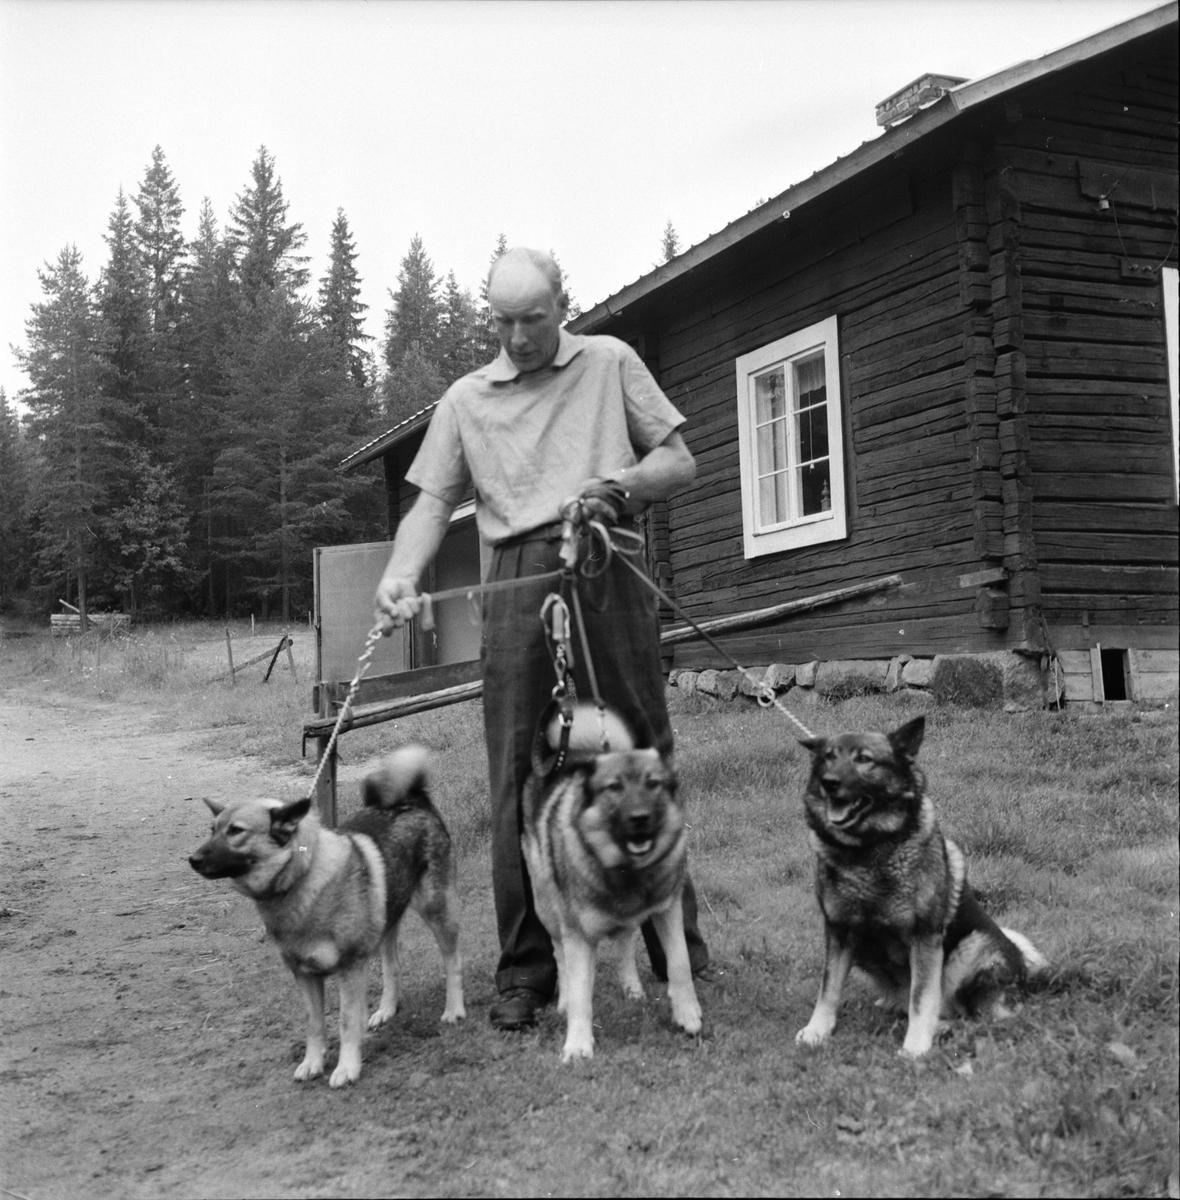 Änga, Olle o Johan Storm, 11 Juli 1961